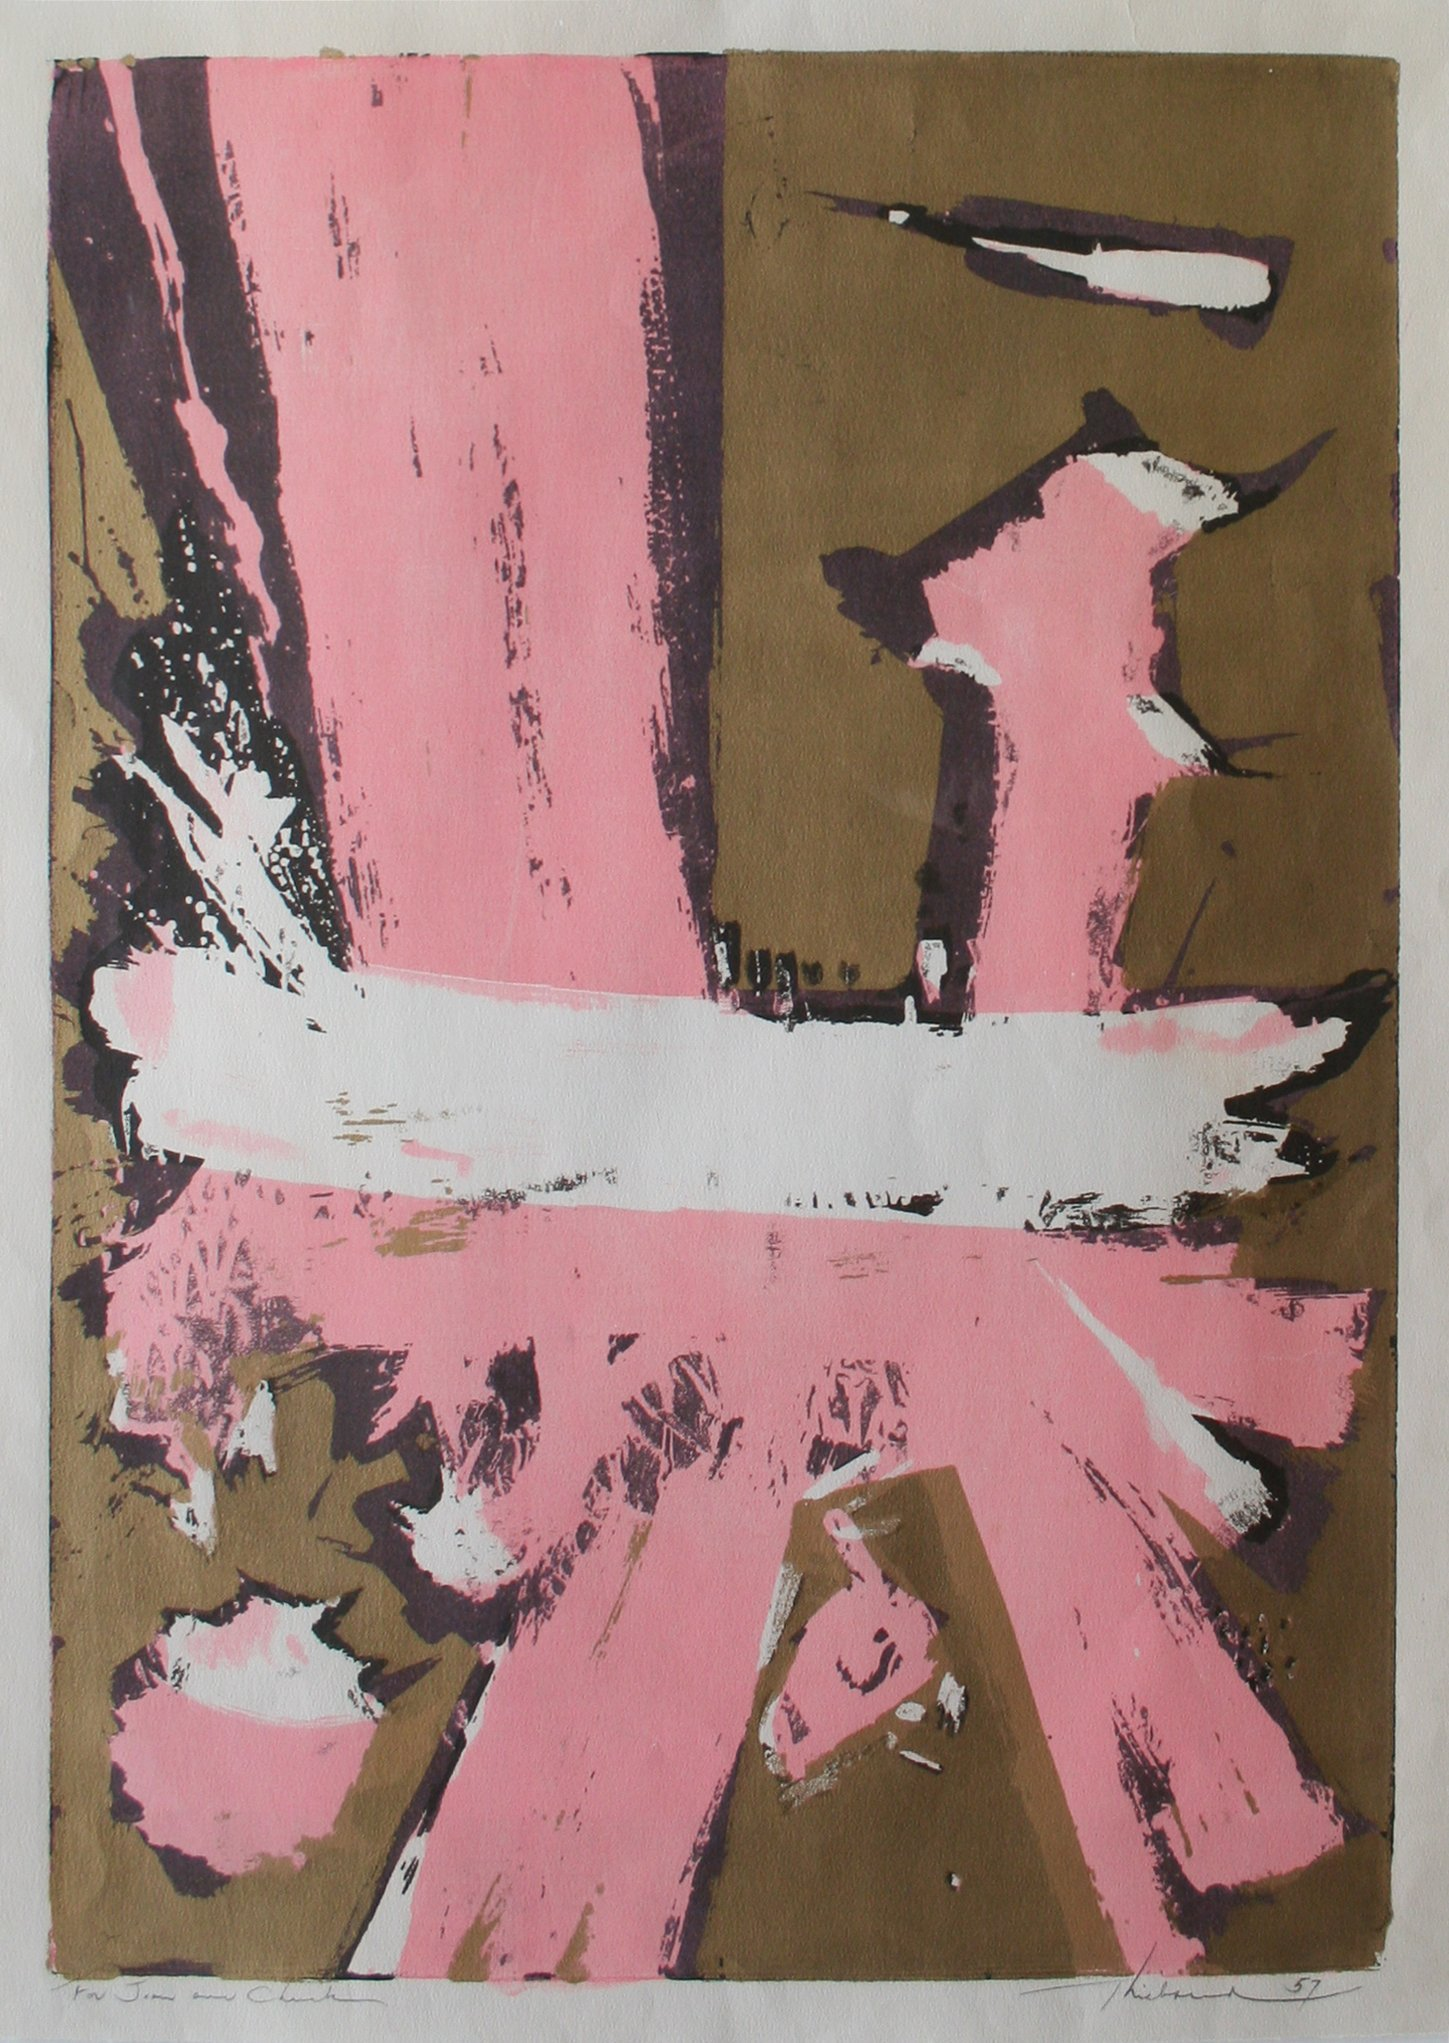 Wayne Thiebaud Untitled, 1957